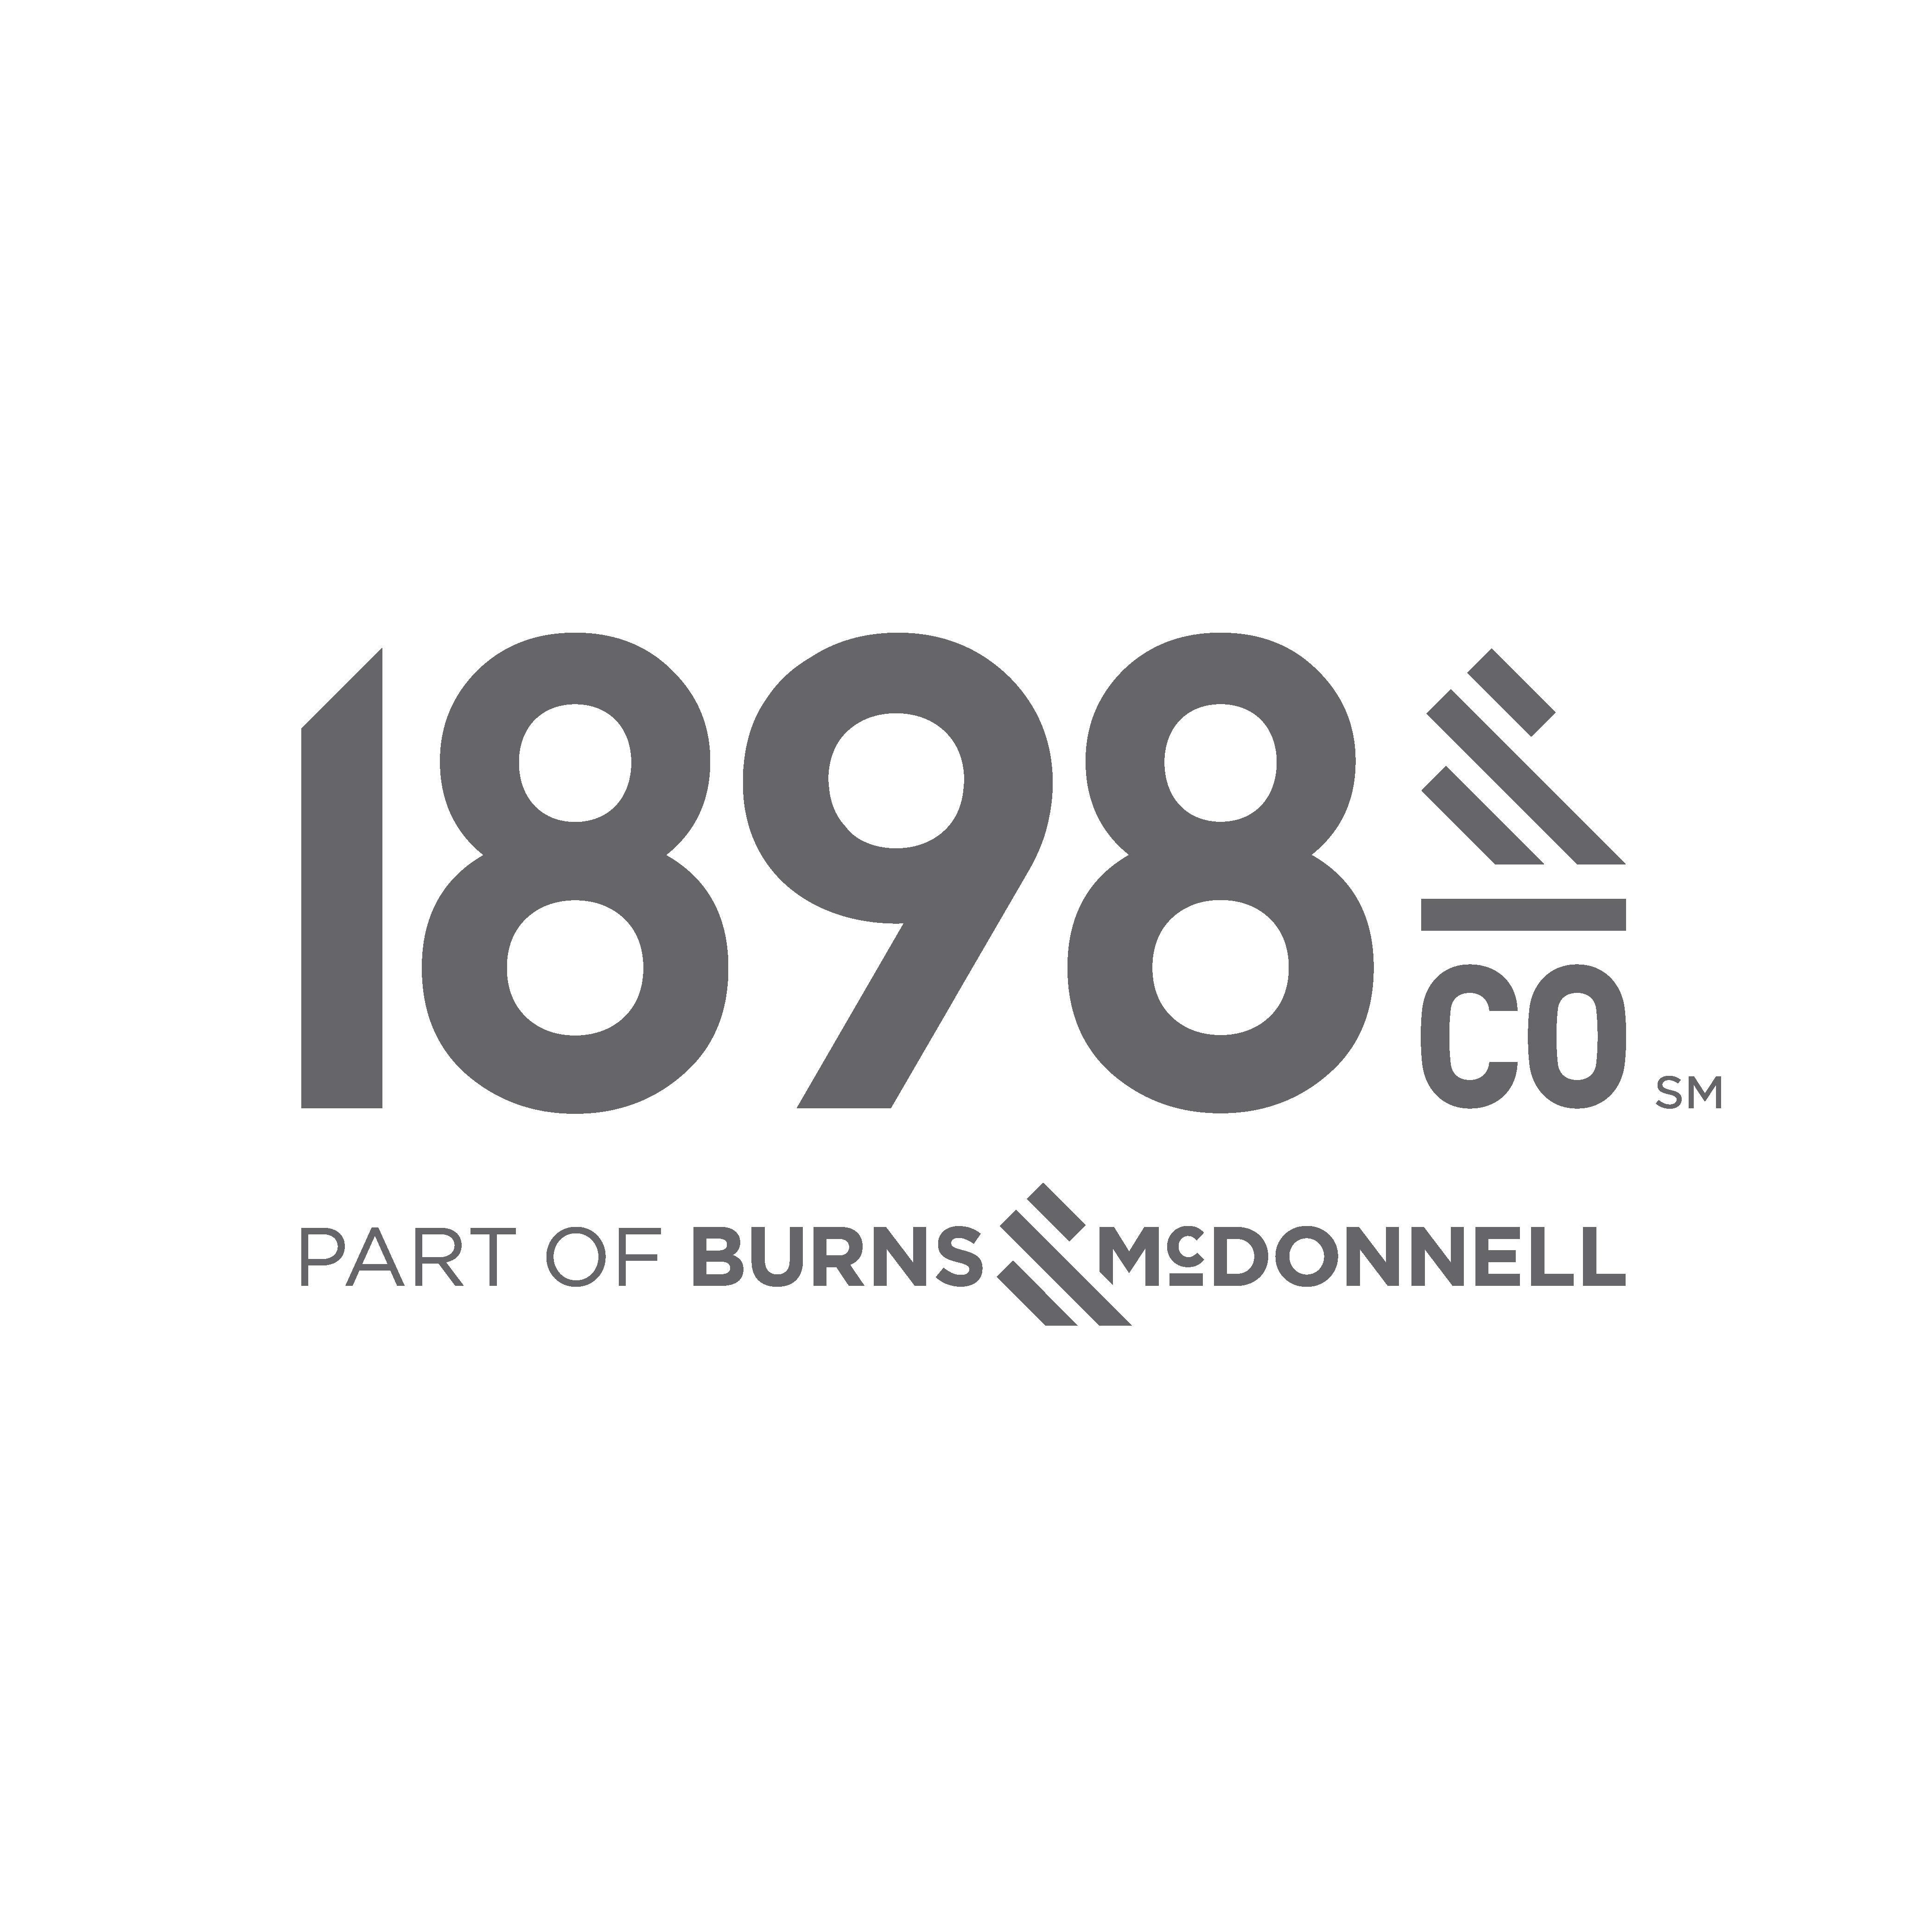 1898 & Co. logo in grey